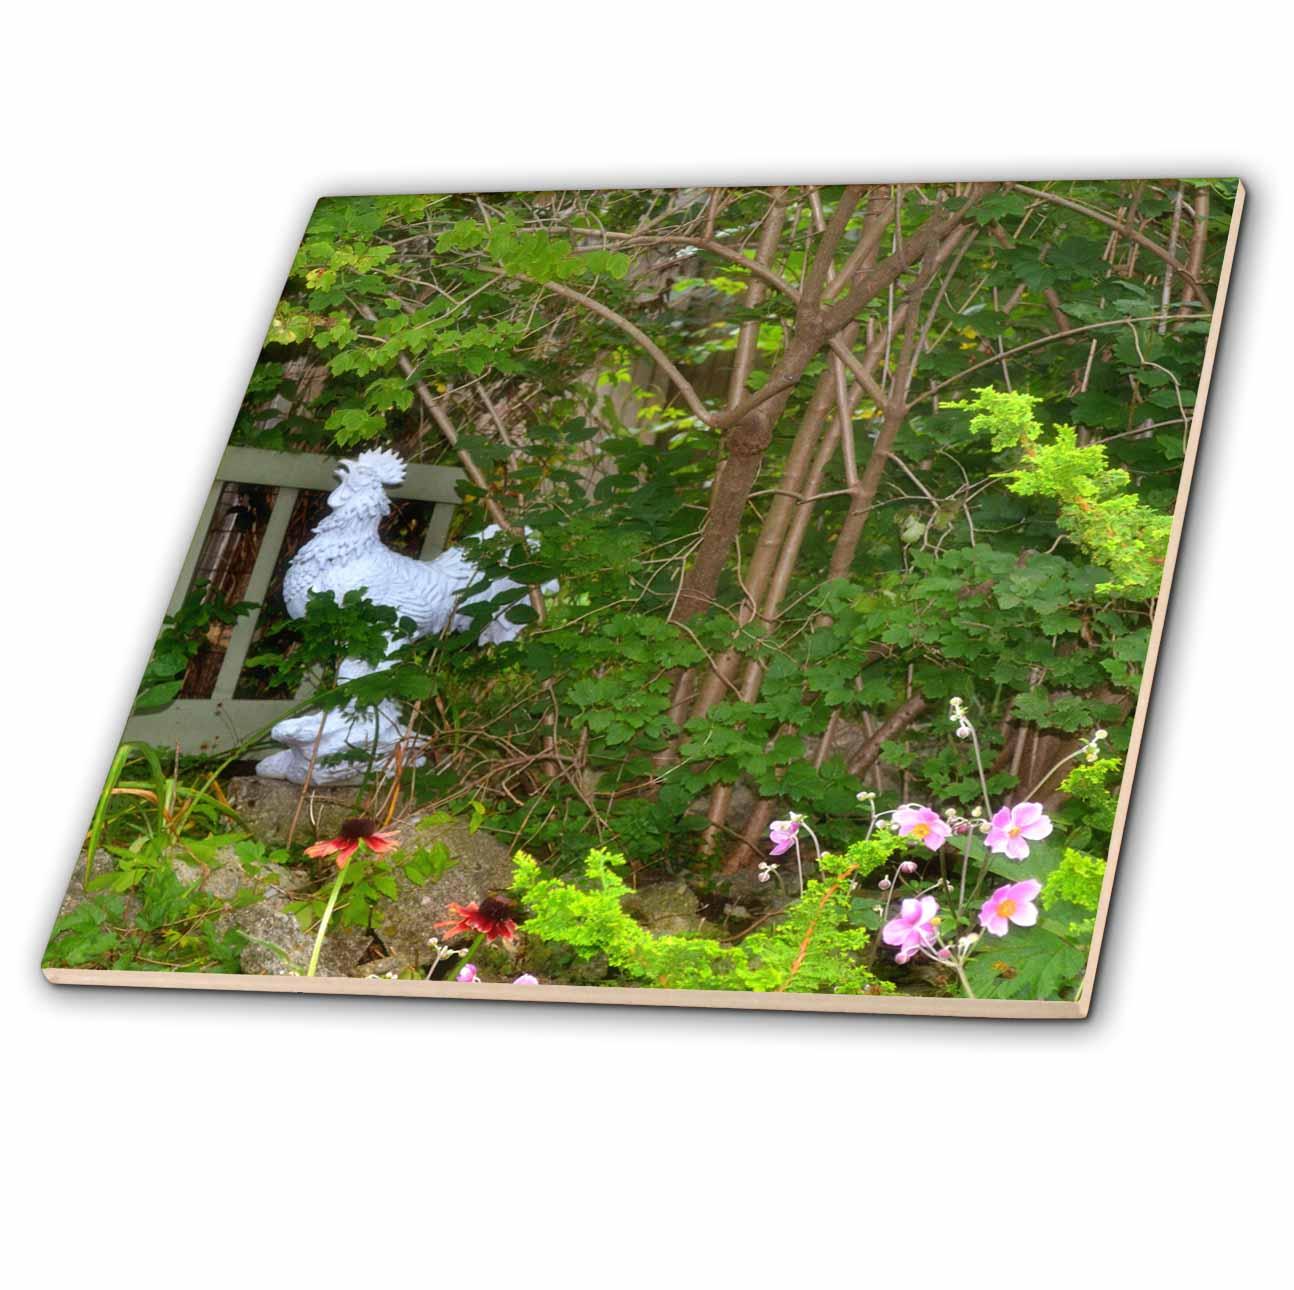 3dRose - ET Photography Garden Décor - A rooster statue - Tiles